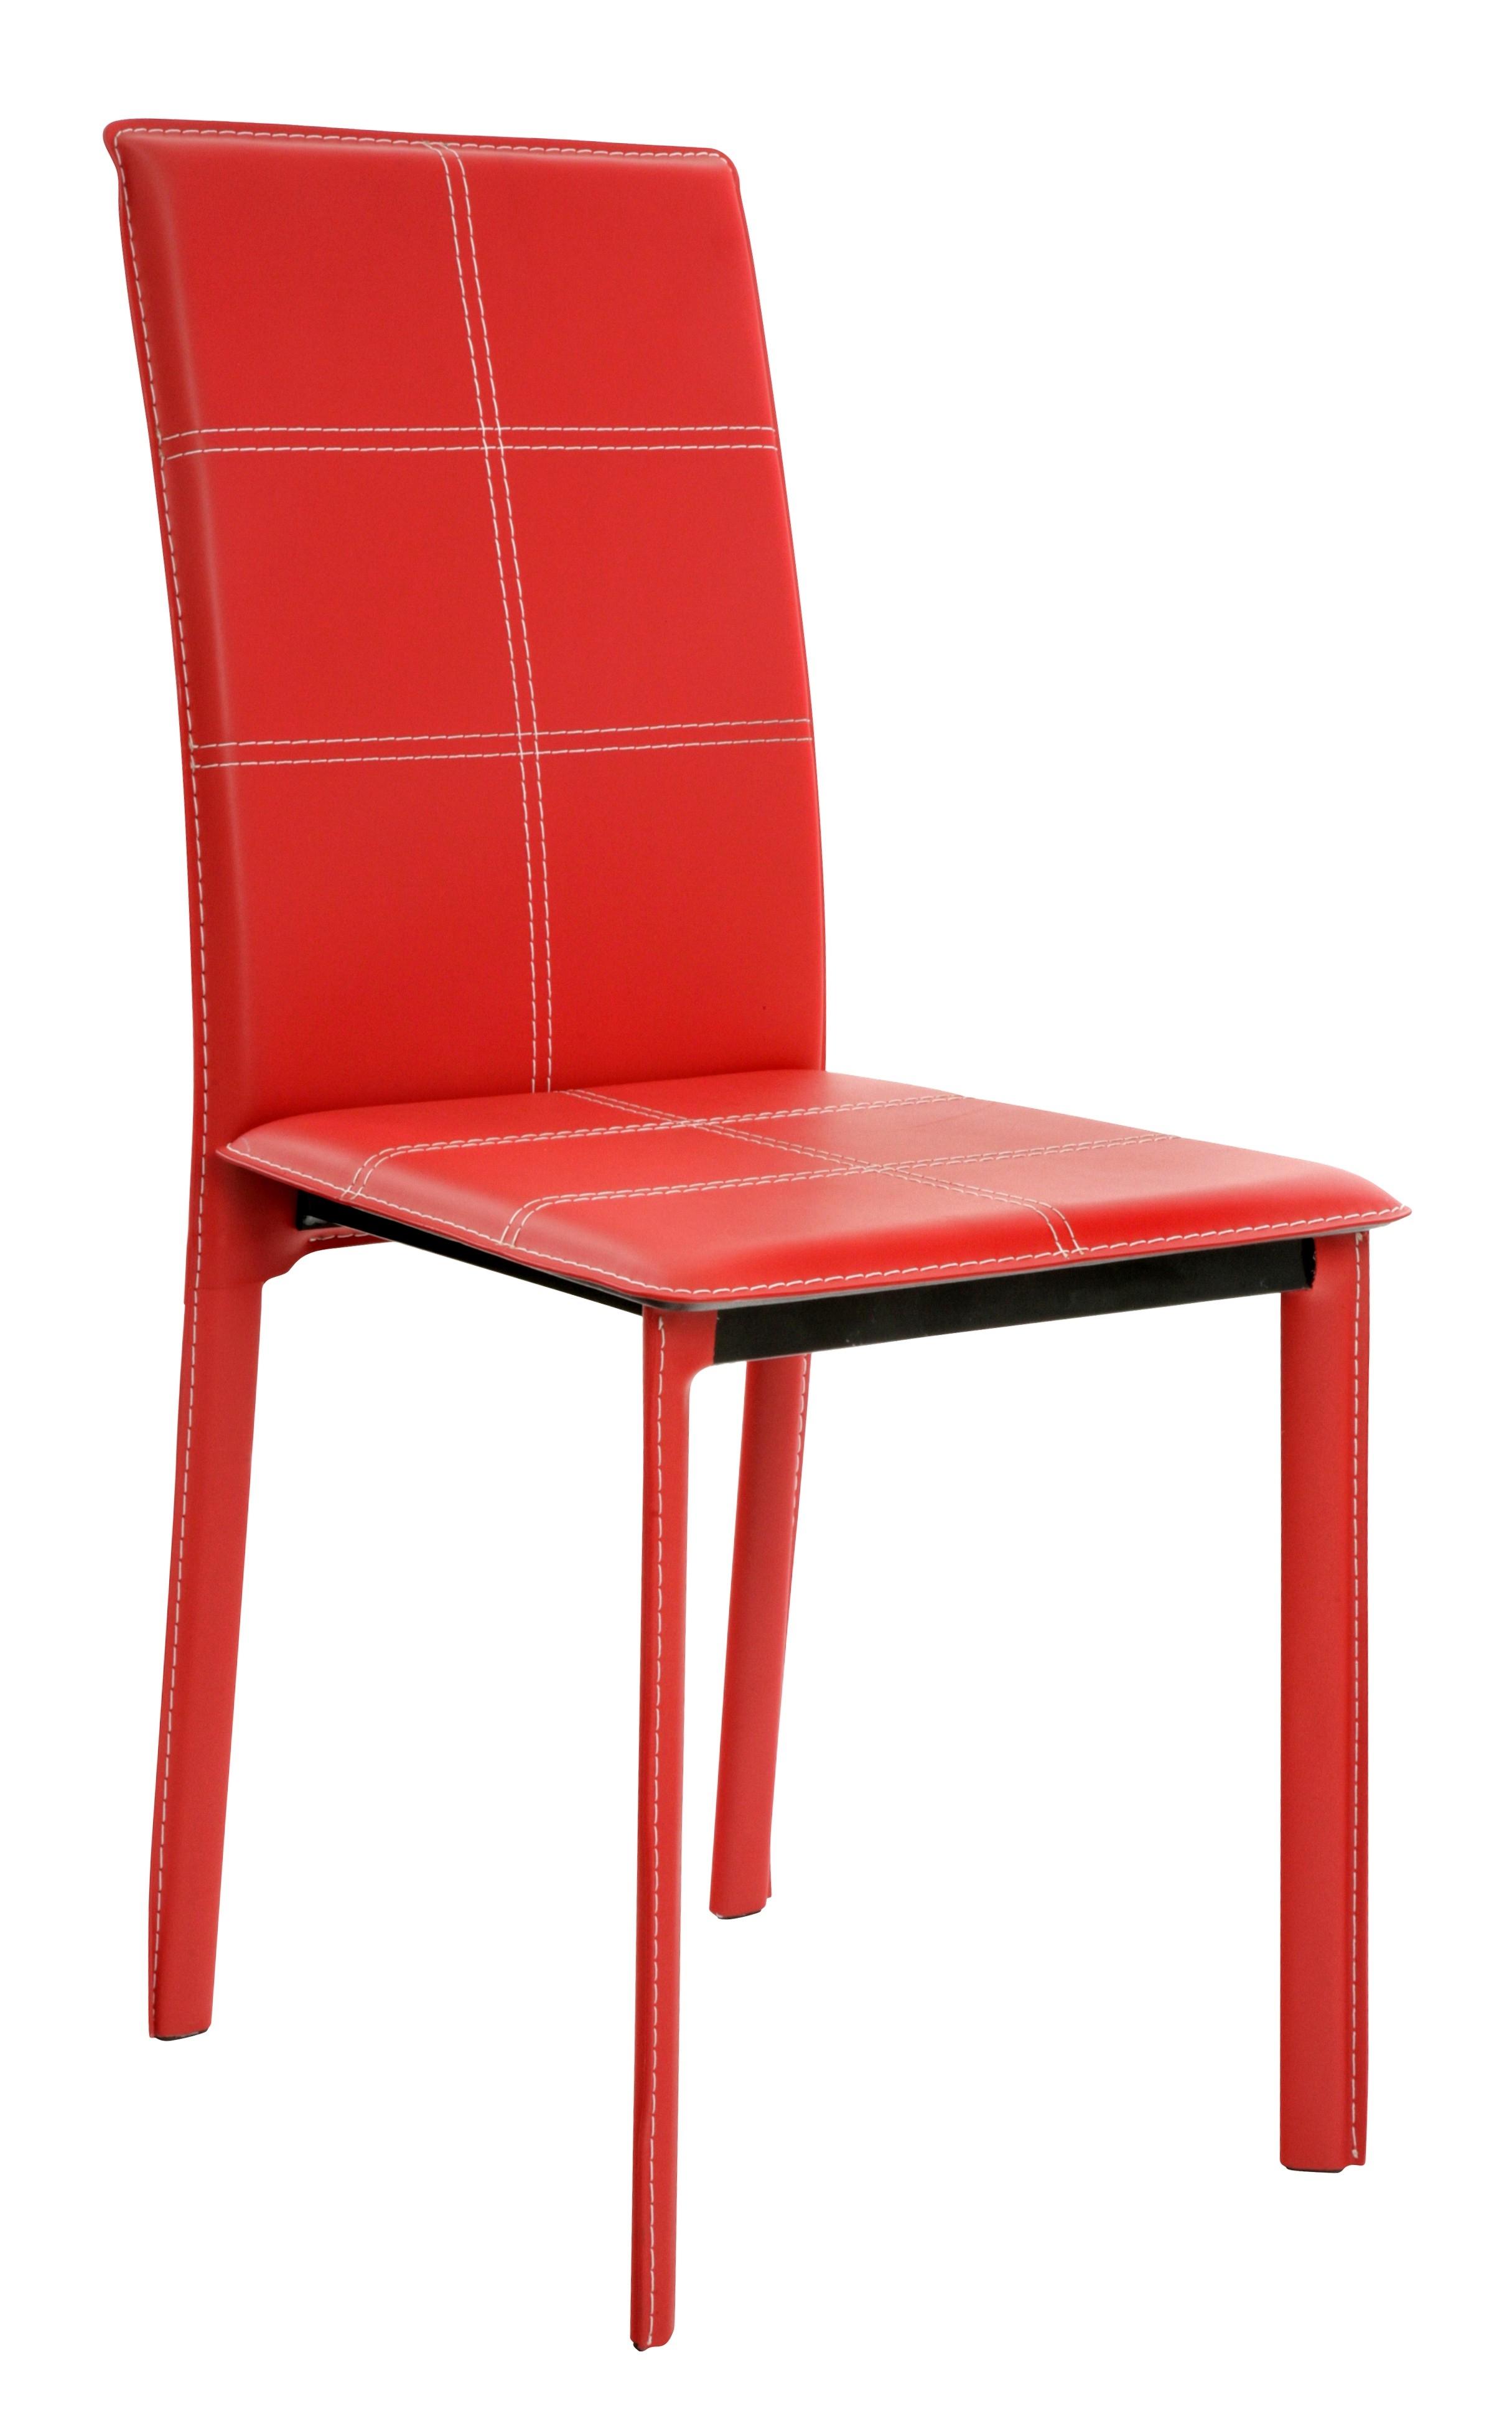 chaise pvc rouge games. Black Bedroom Furniture Sets. Home Design Ideas